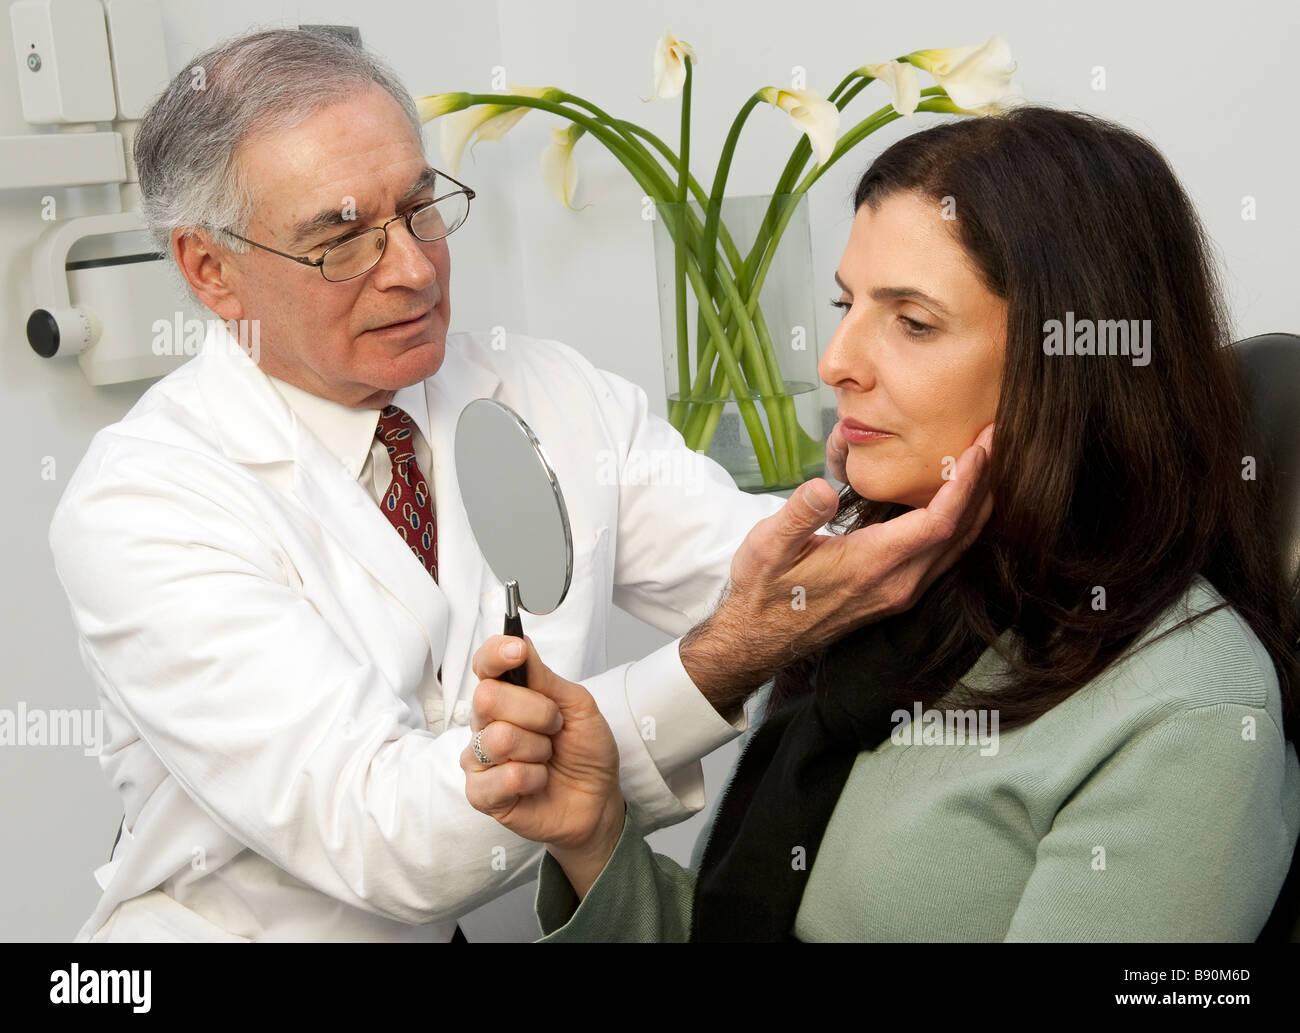 Kosmetische Chirurgie Beratung mit Patienten. Stockbild